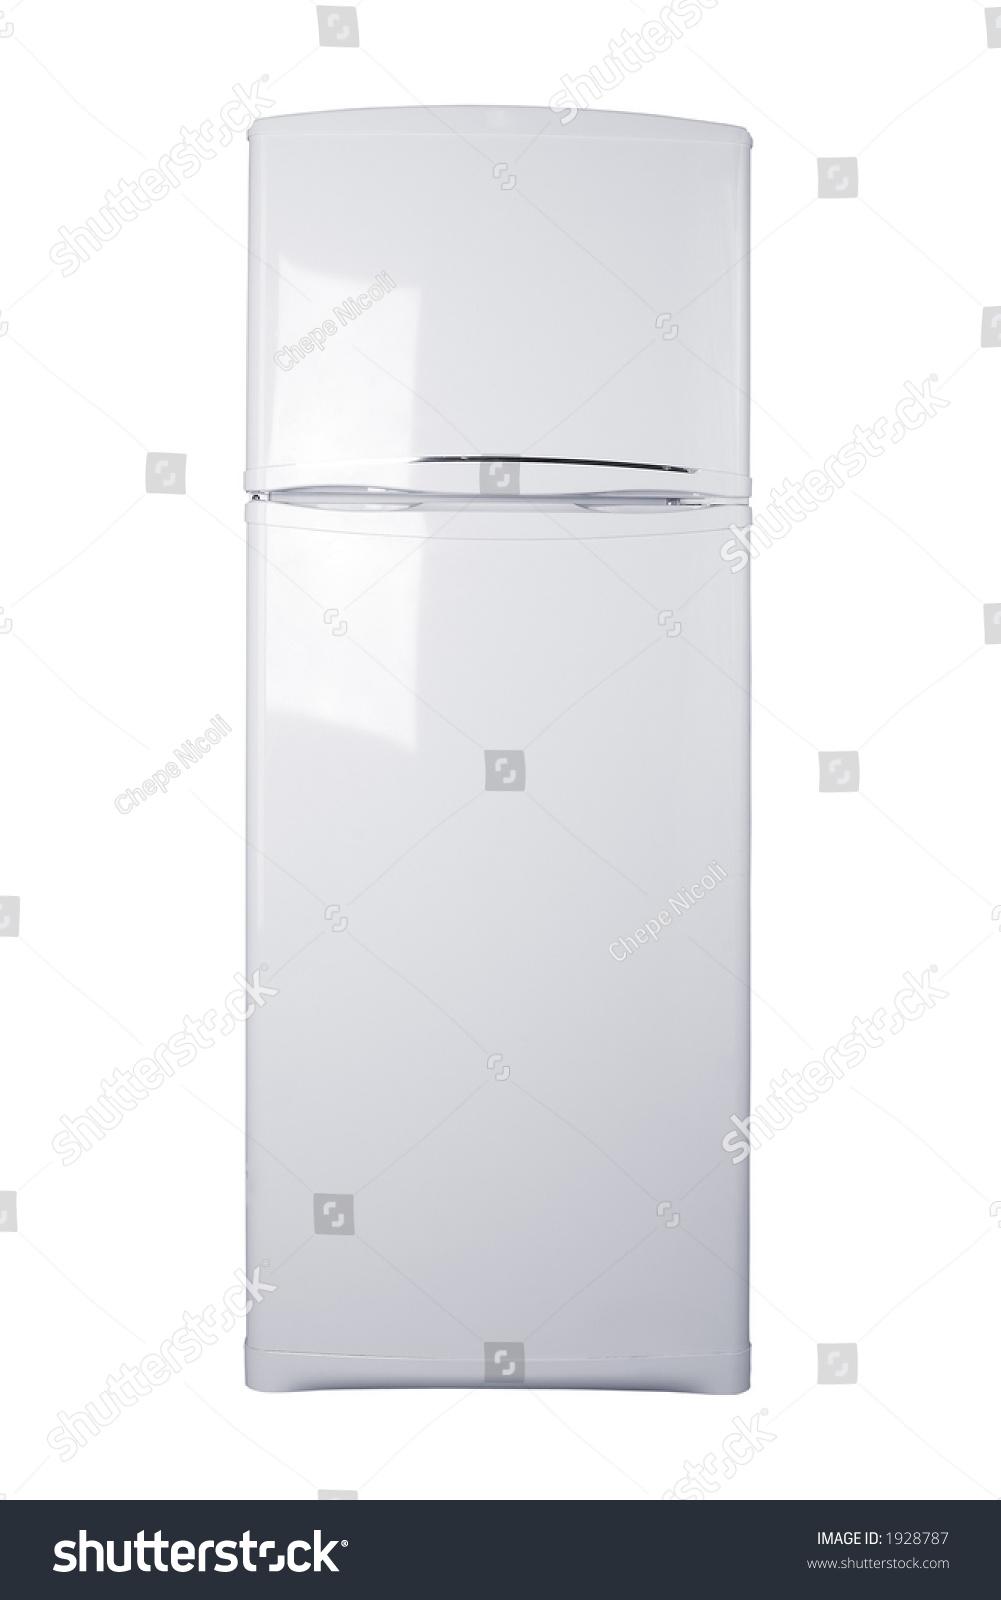 Small Refrigerator White Background Stock Photo 1928787